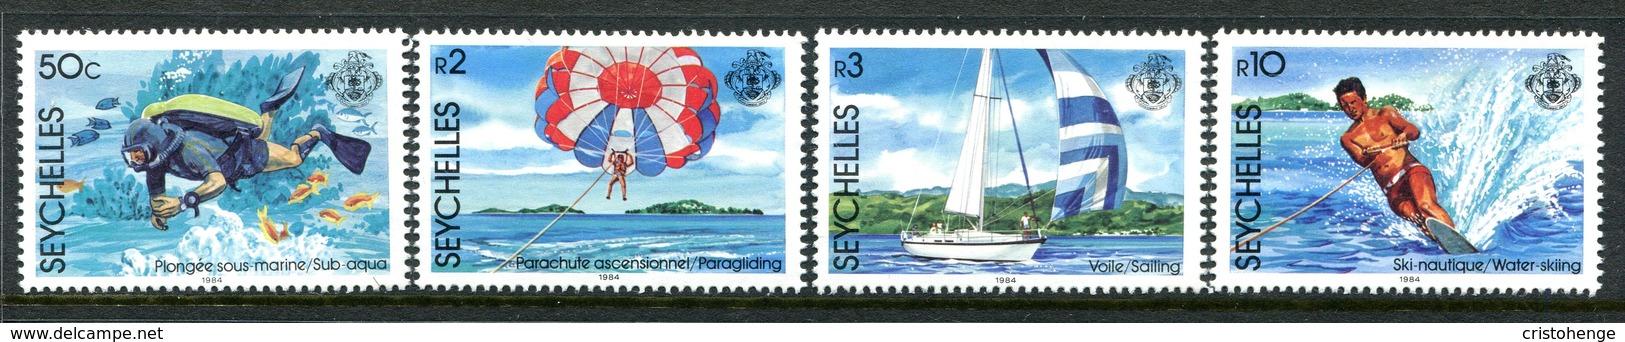 Seychelles 1984 Water Sports Set MNH (SG 597-600) - Seychelles (1976-...)